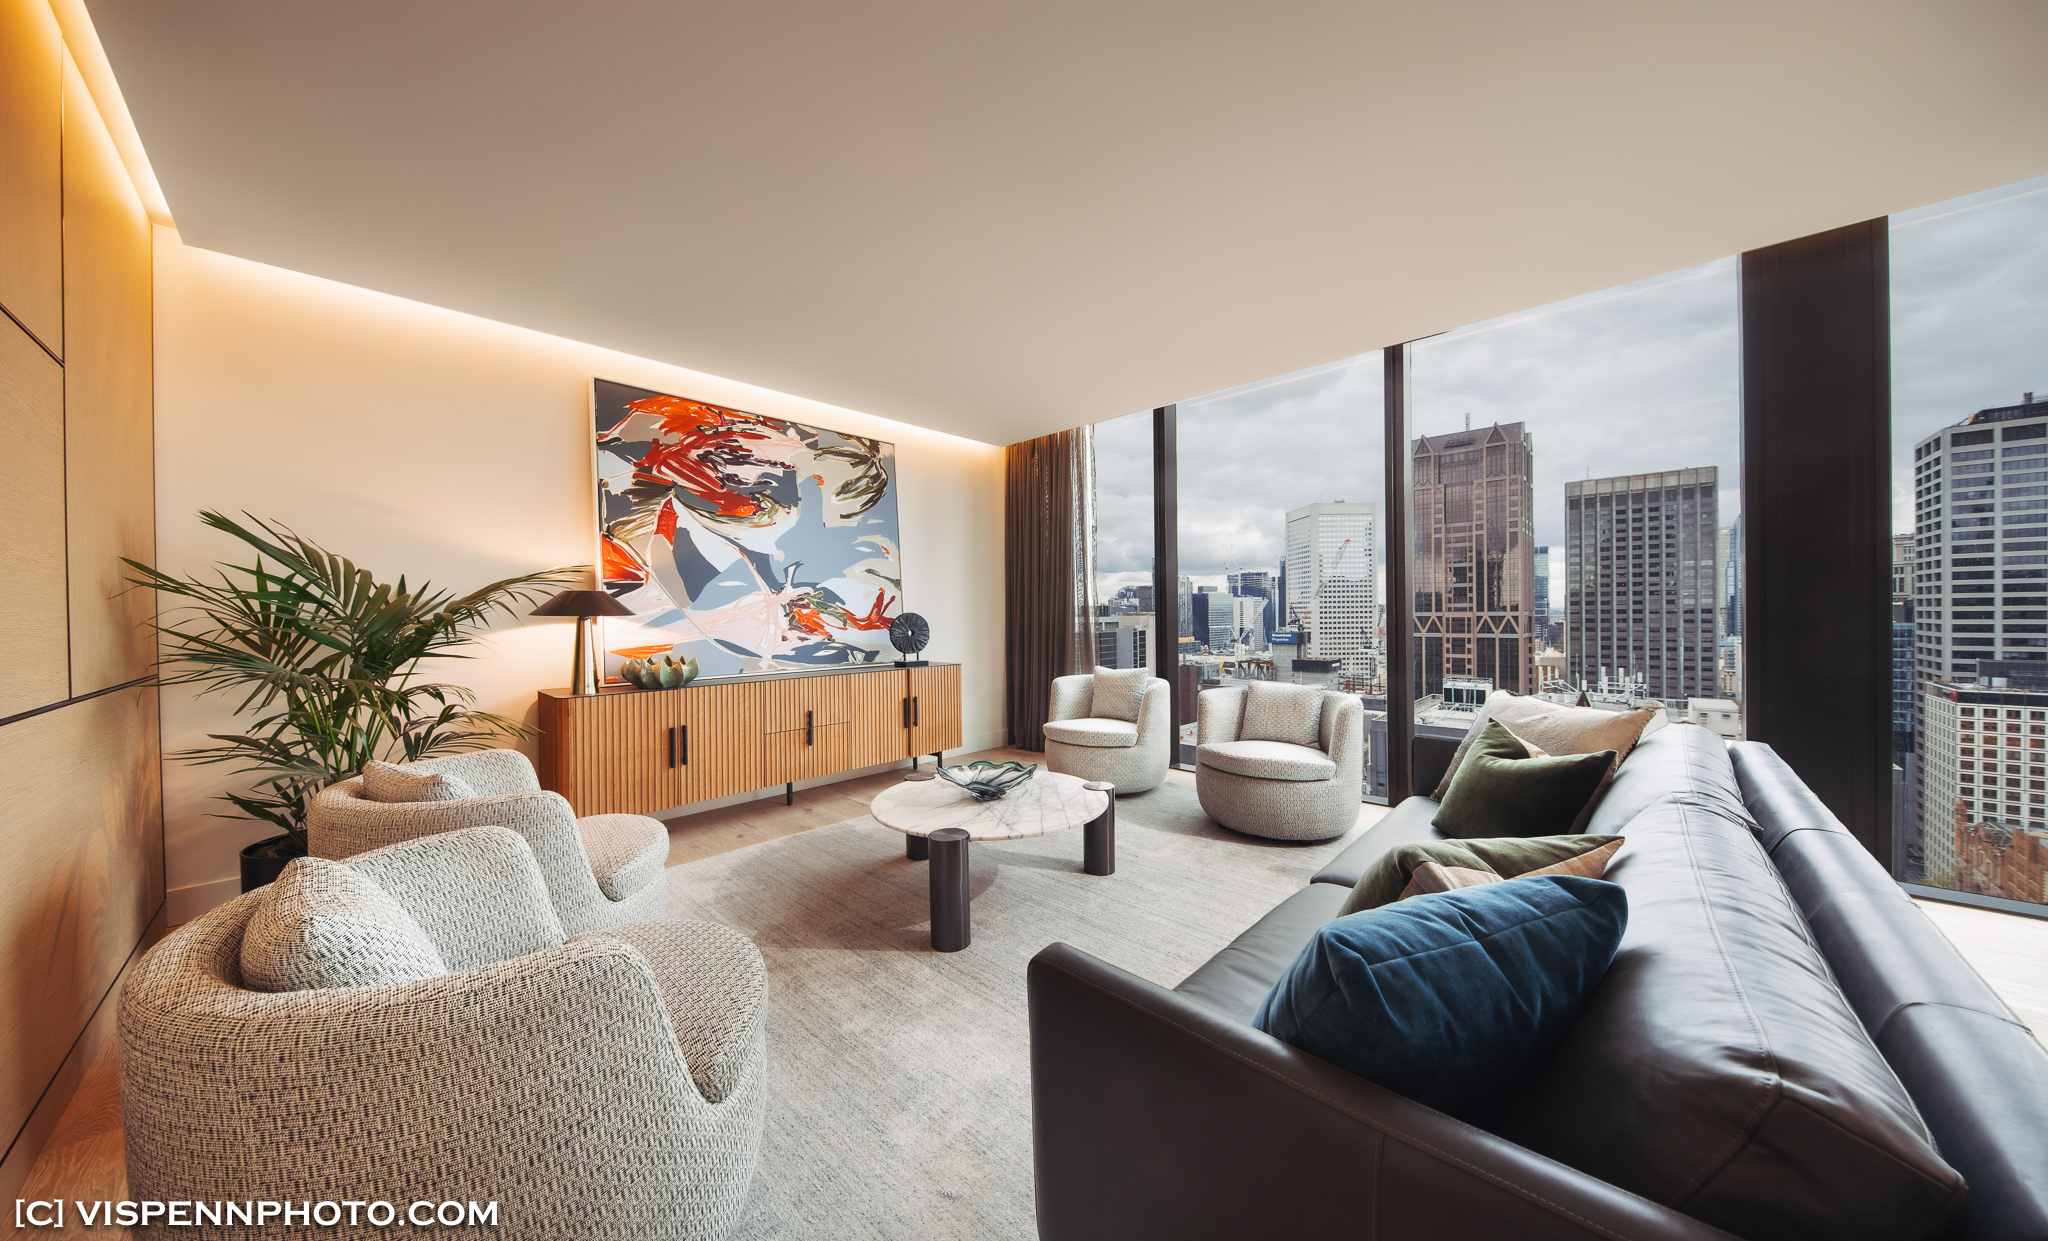 REAL ESTATE INTERIOR Photography Melbourne VISPENN 墨尔本 地产摄影 公寓拍摄 豪宅拍摄 VR远程看房 房产航拍 HAR00052 Edit